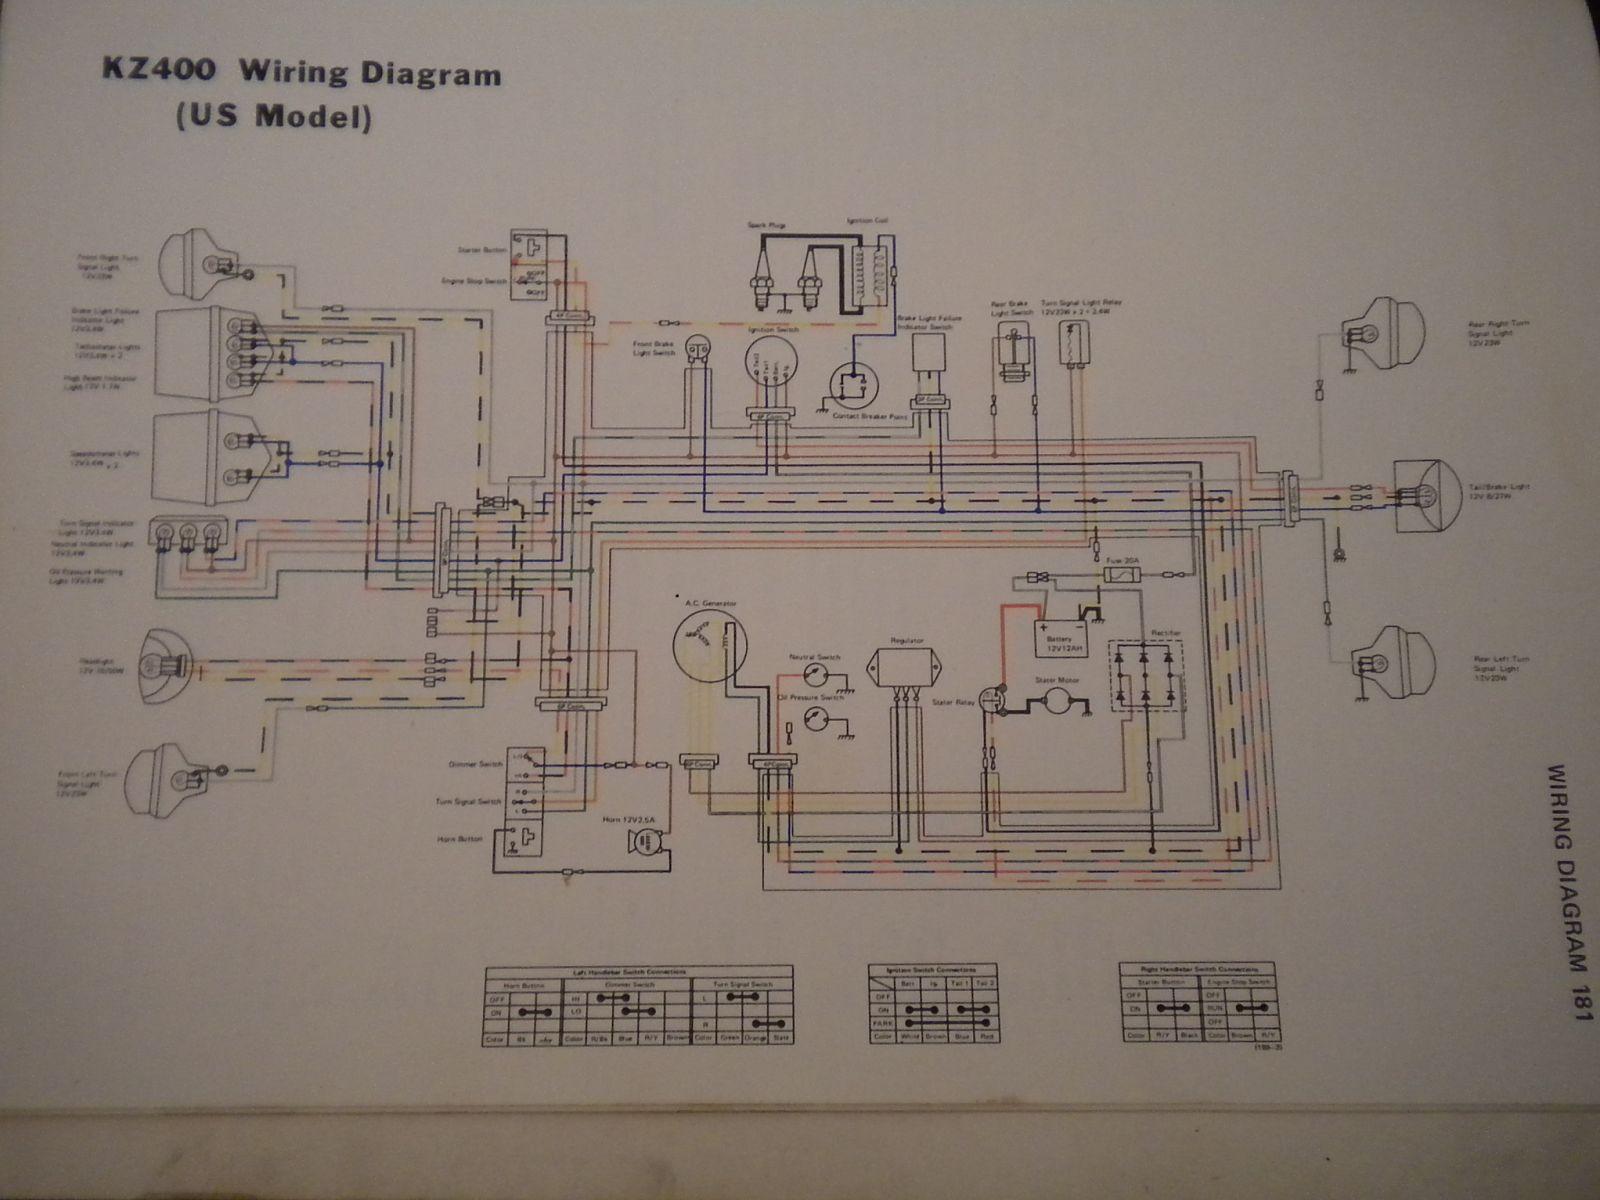 74 kz 400 BOBBER wiring diagram - KZRider Forum - KZRider ... Kz Wiring Diagram on electronic circuit diagrams, troubleshooting diagrams, electrical diagrams, switch diagrams, engine diagrams, hvac diagrams, battery diagrams, smart car diagrams, transformer diagrams, pinout diagrams, honda motorcycle repair diagrams, gmc fuse box diagrams, motor diagrams, led circuit diagrams, internet of things diagrams, sincgars radio configurations diagrams, friendship bracelet diagrams, lighting diagrams, series and parallel circuits diagrams,